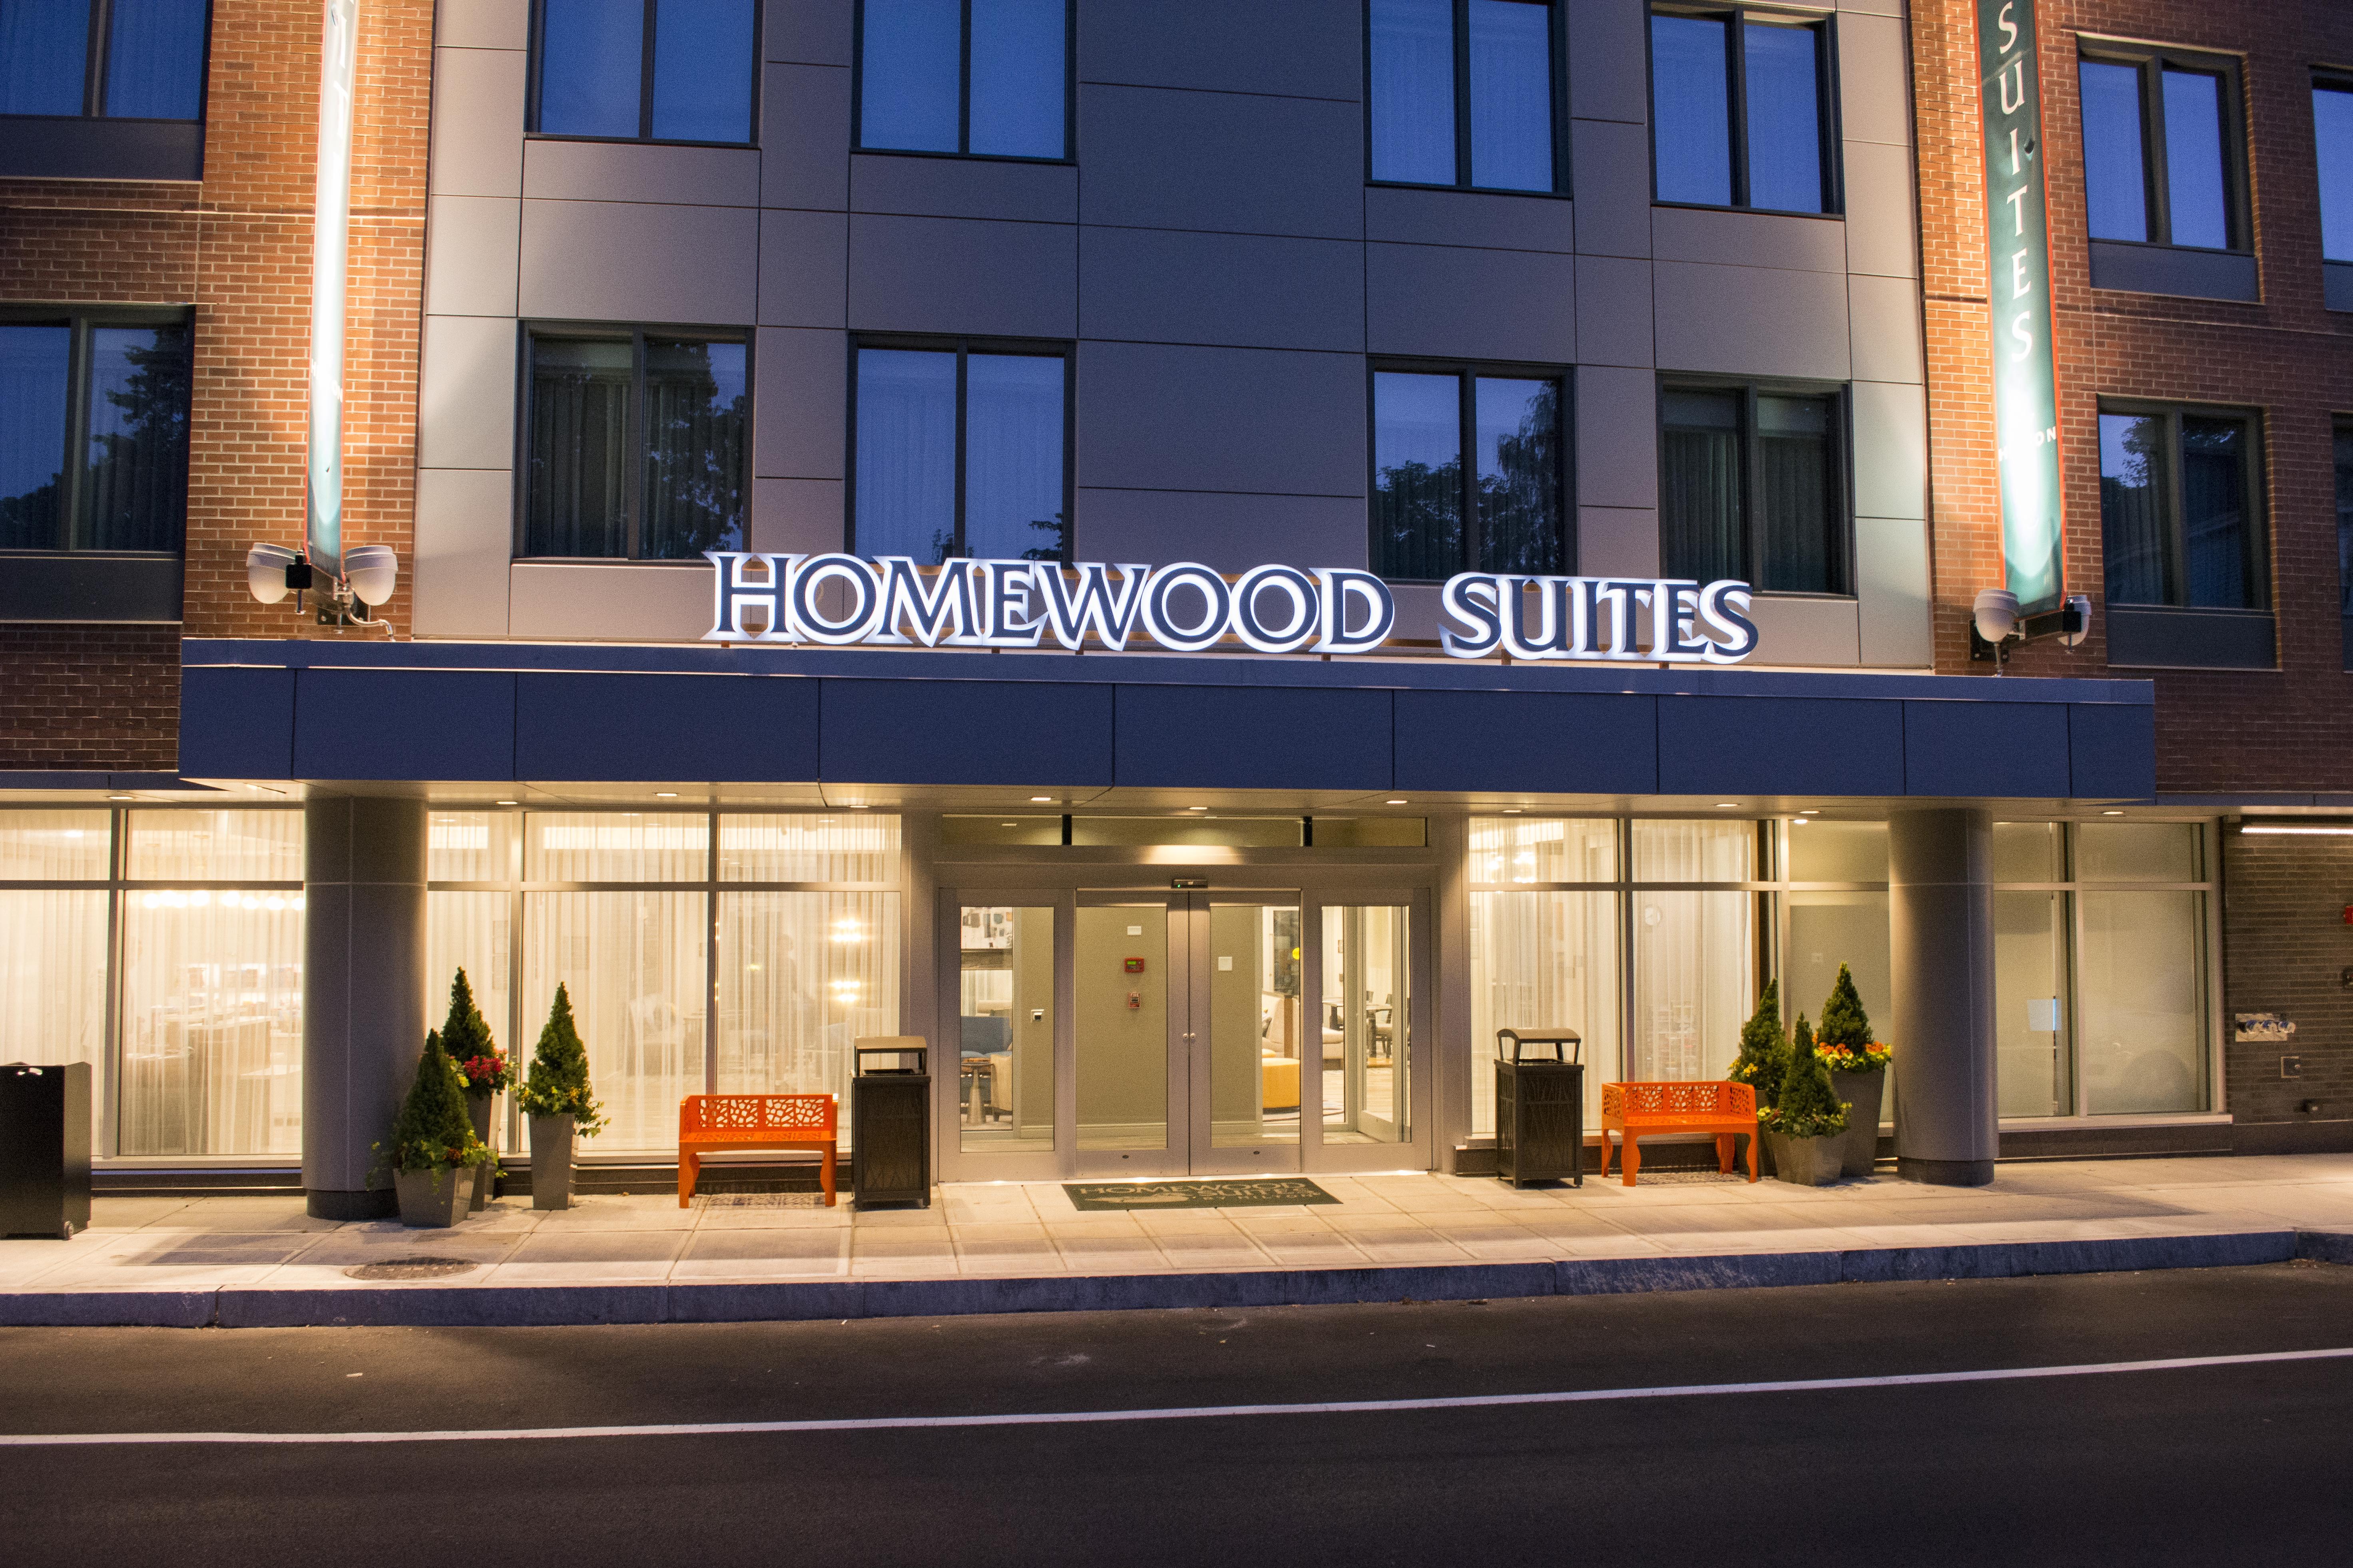 Brookline Hilton Homewood Suites Exterior